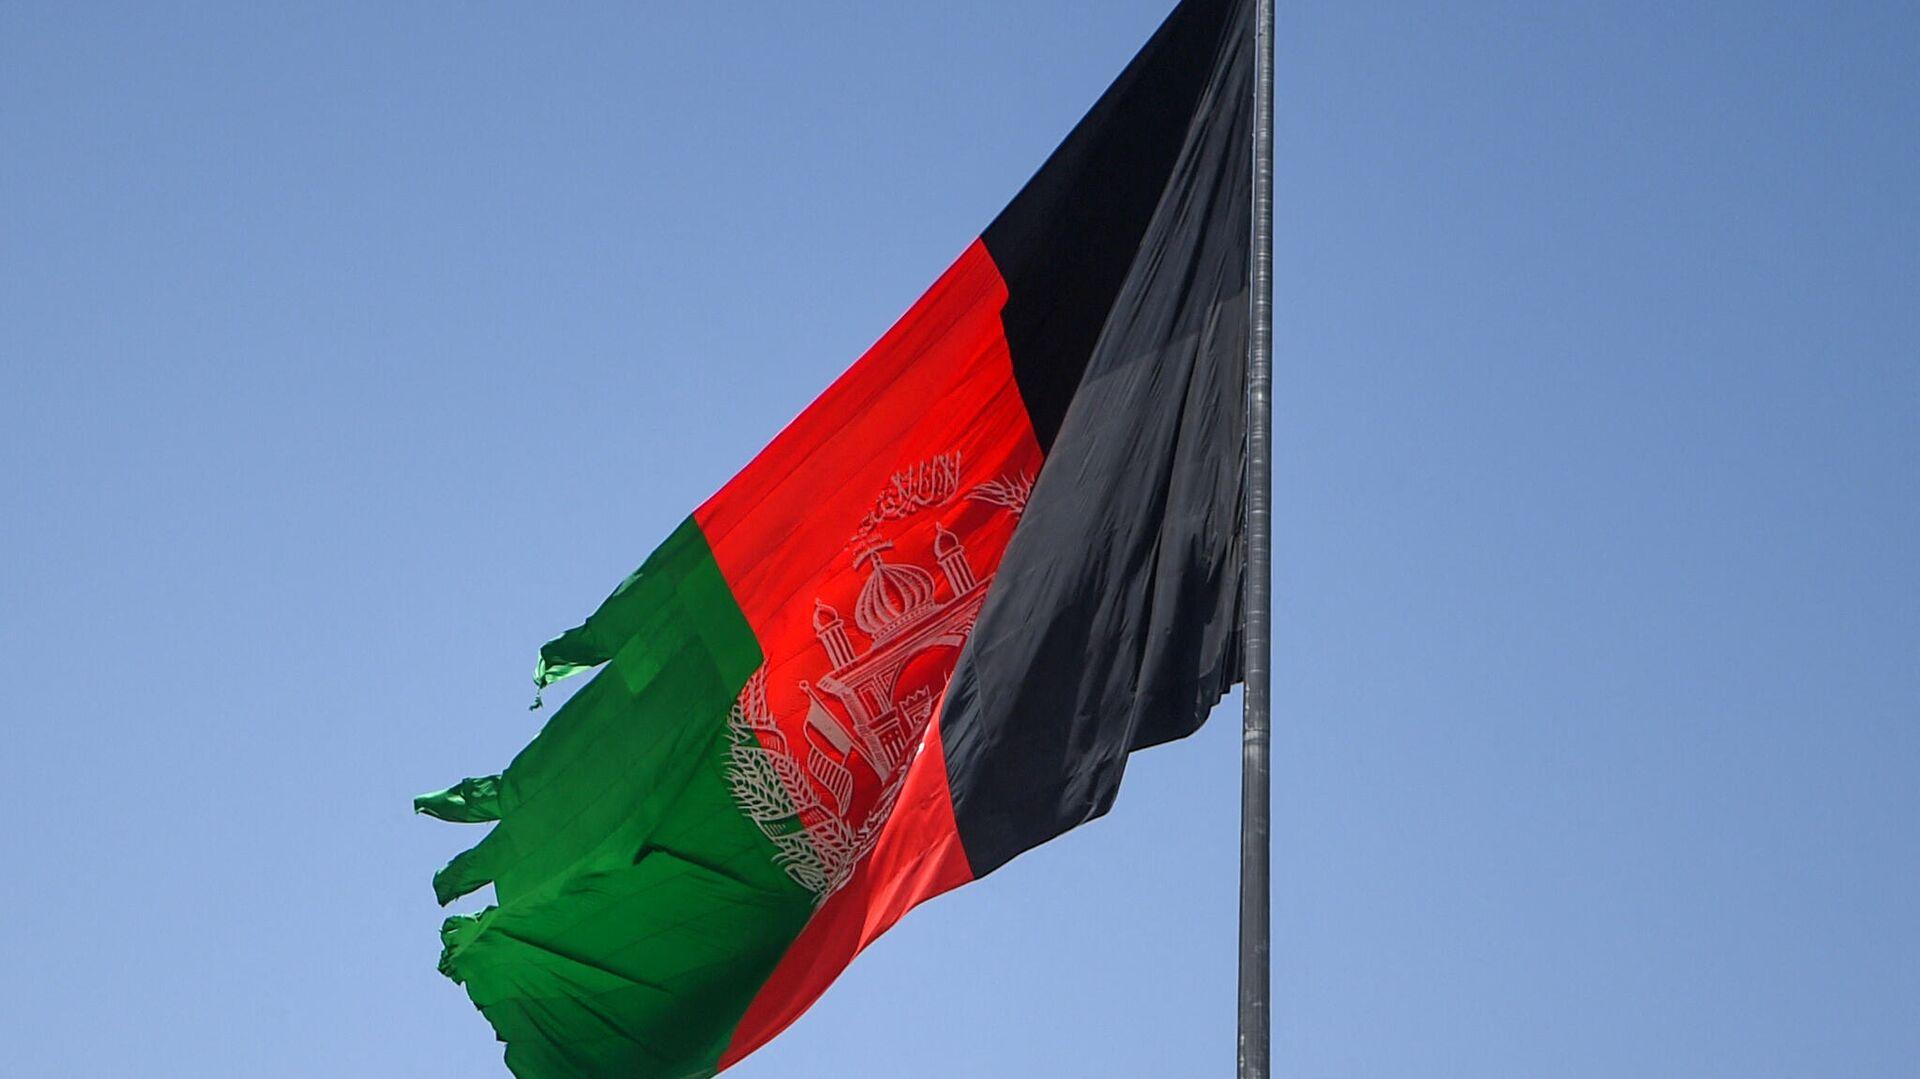 Bandera de Afganistán - Sputnik Mundo, 1920, 18.03.2021